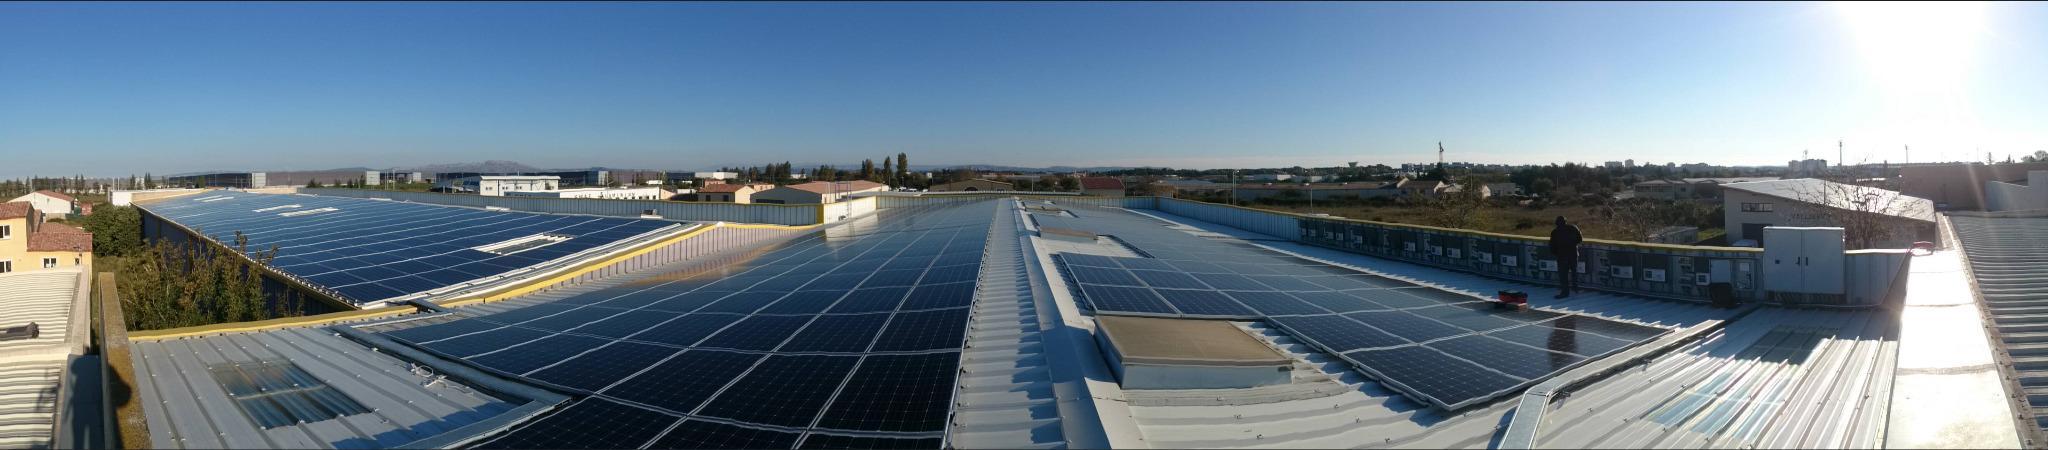 centrale solaire toiture